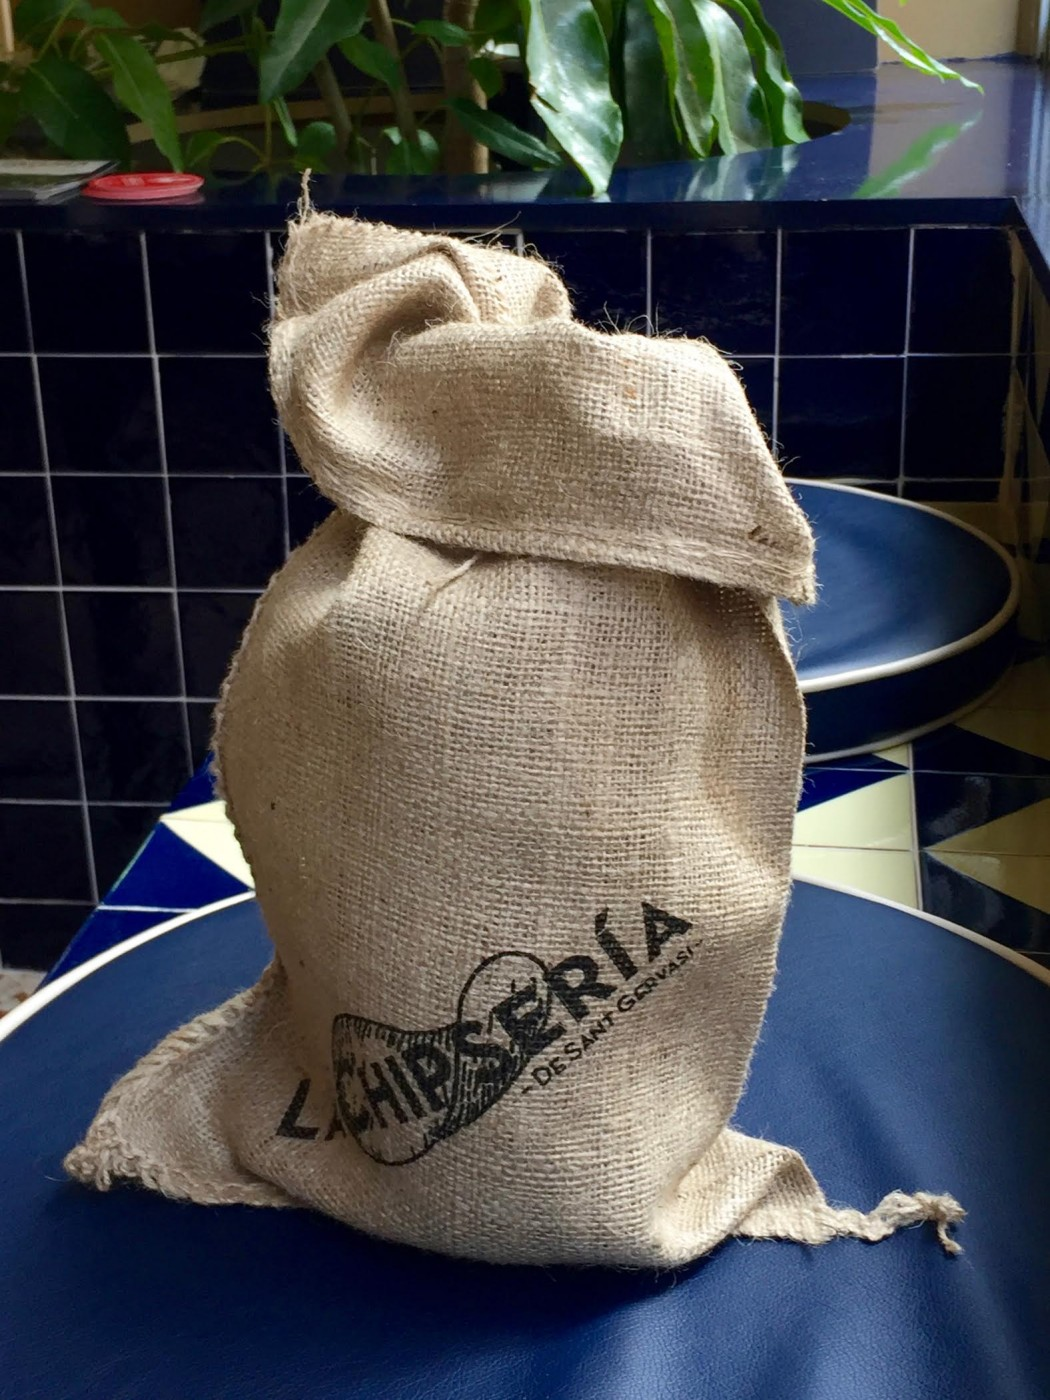 la-chipsería-rockinchiclifestyle-saco